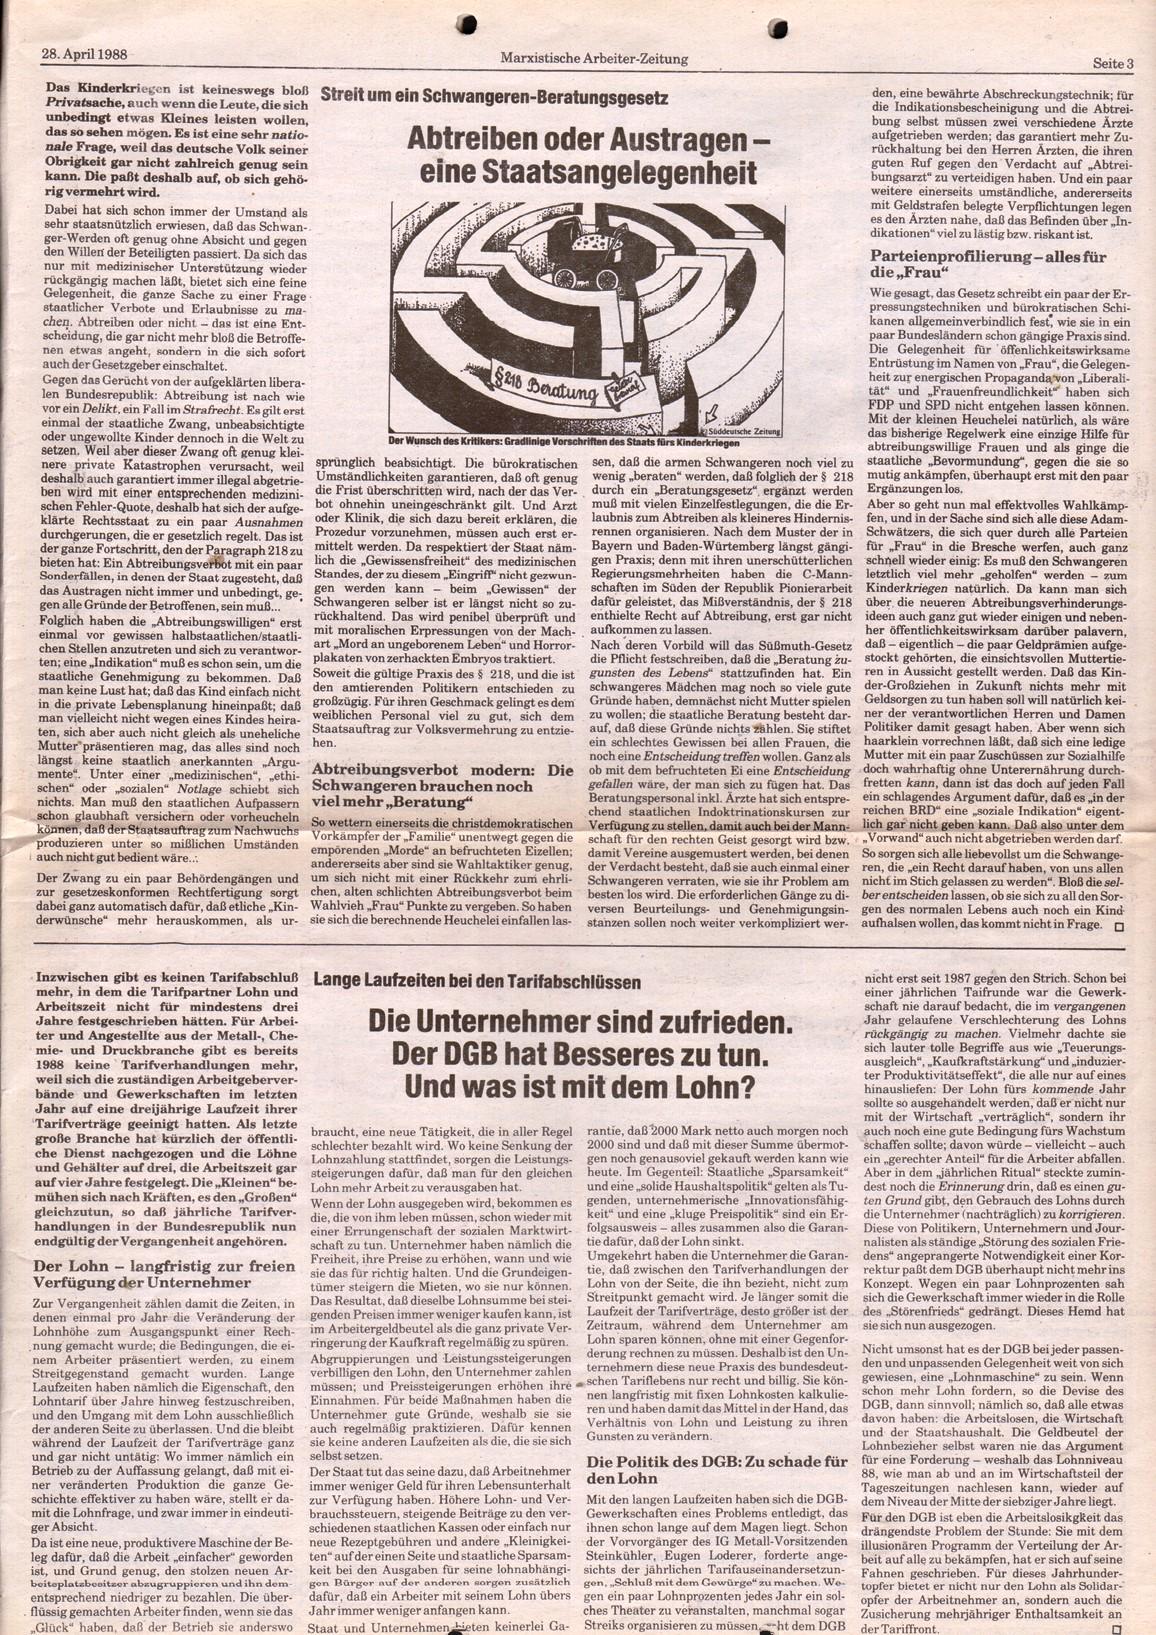 Muenchen_MG_MAZ_19880428_03